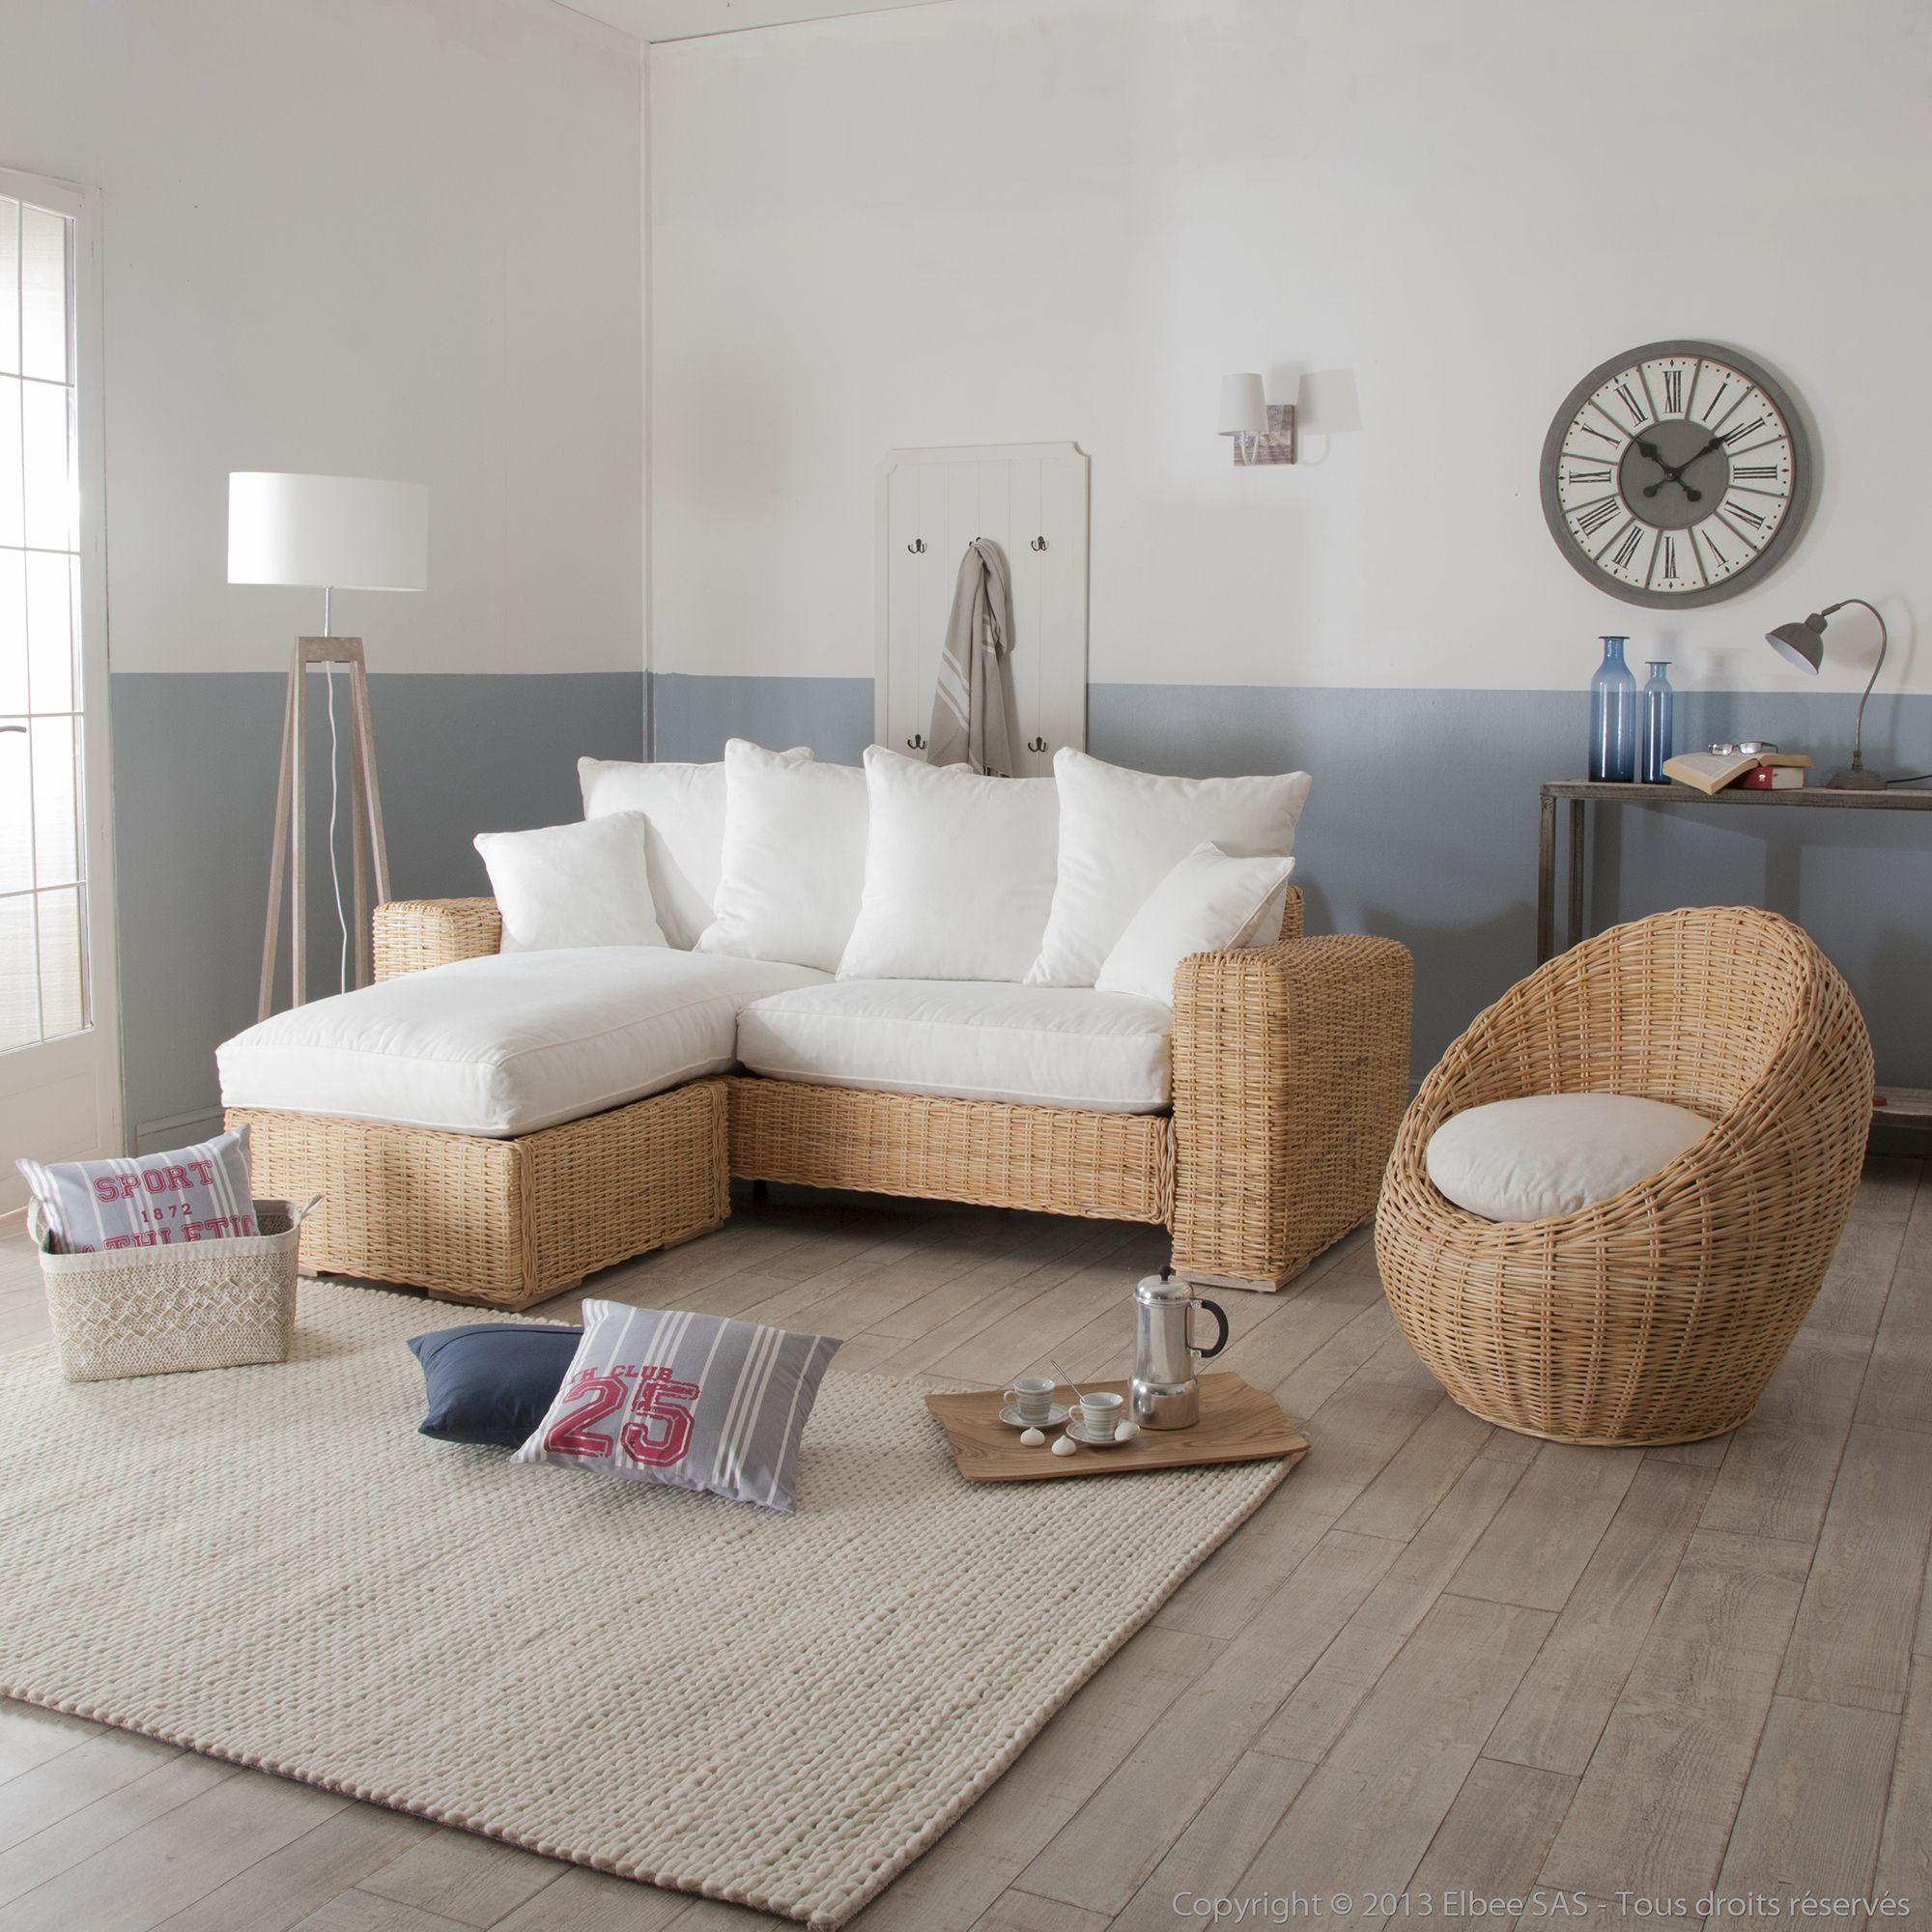 fauteuil oeuf en rotin et tissu blanc